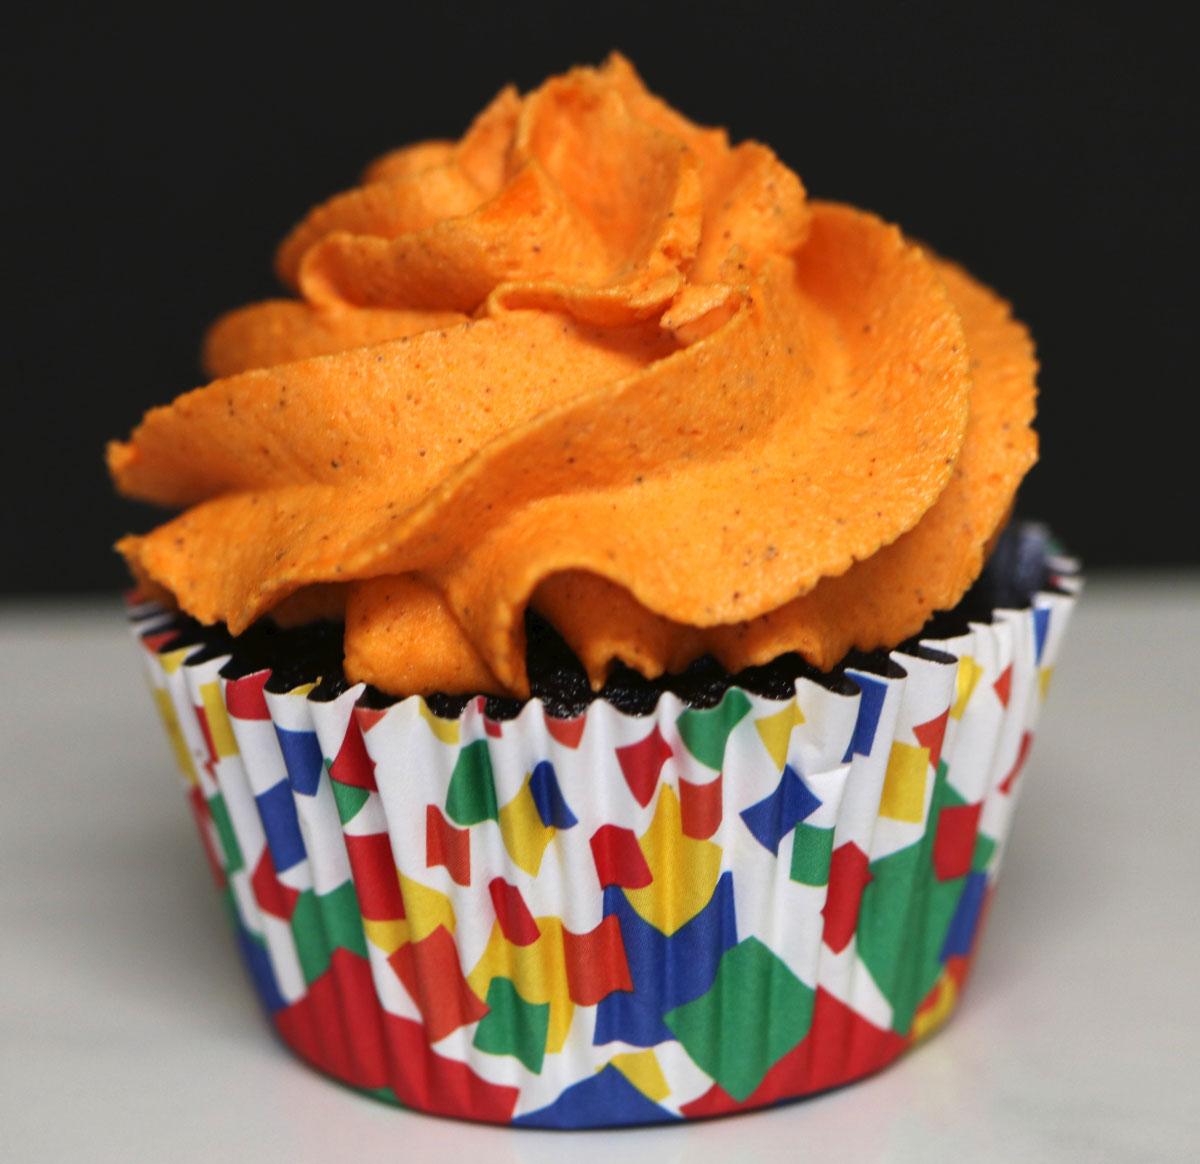 orangespicecupcakeCUa.jpg